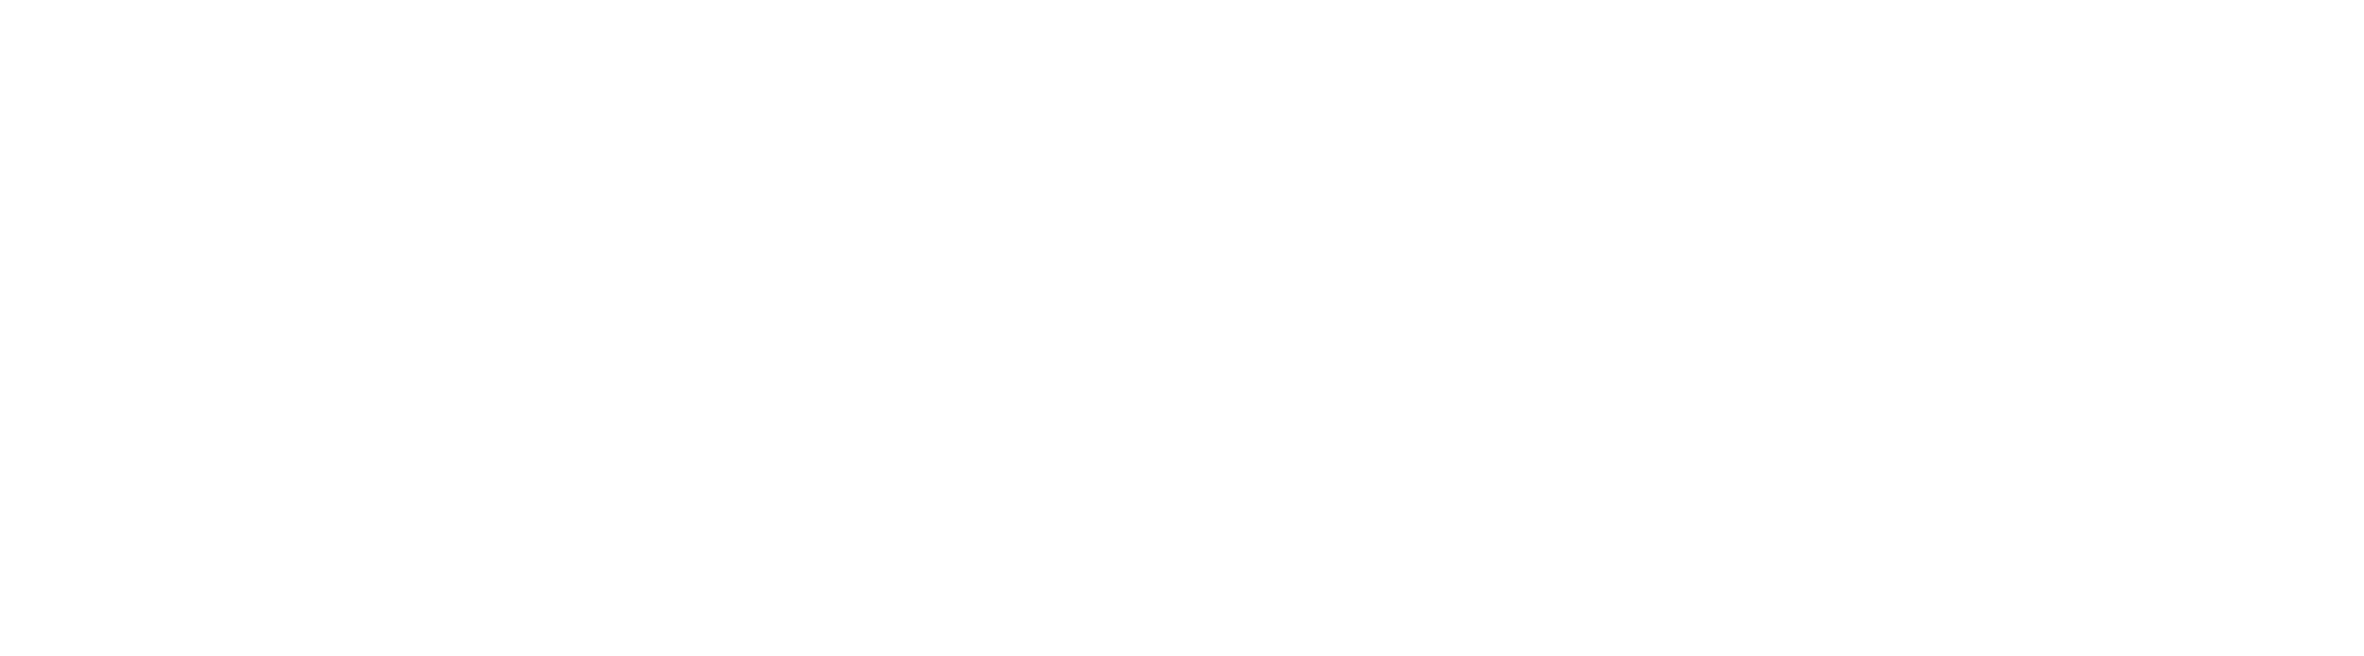 Portal de Dados Abertos do IFMG